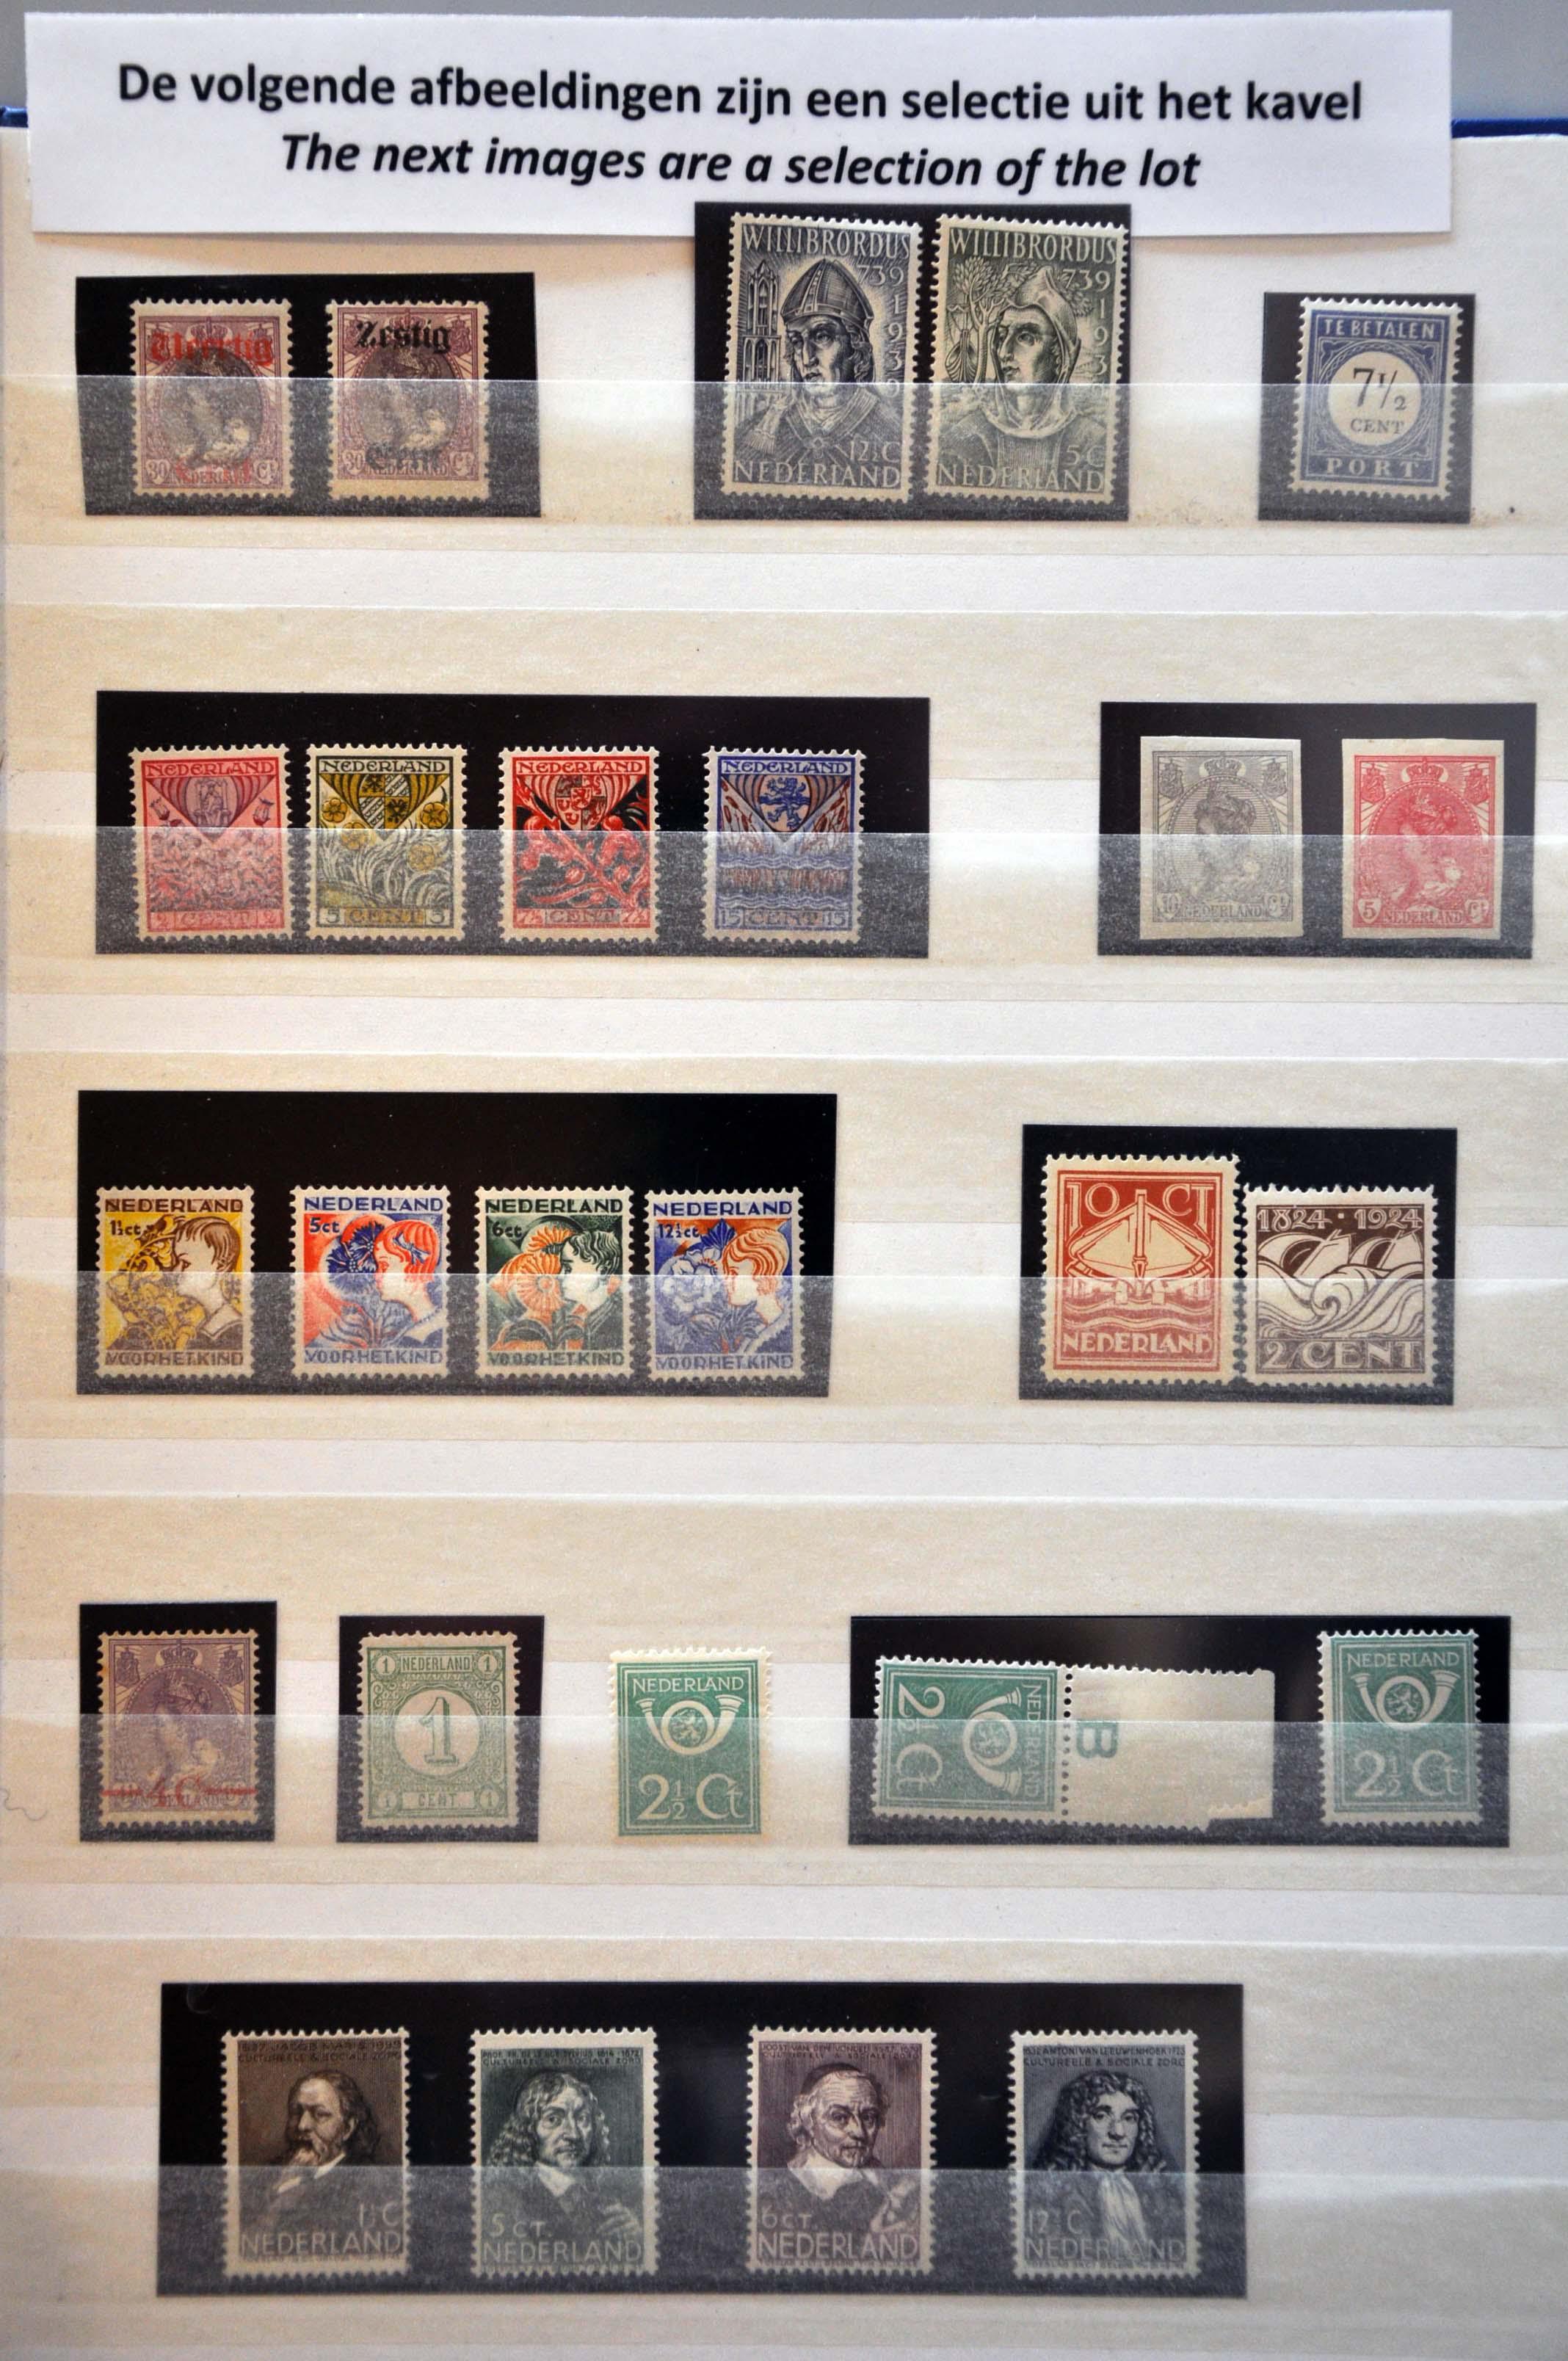 Lot 1593 - Netherlands and former colonies Netherlands -  Corinphila Veilingen Auction 239: General sale